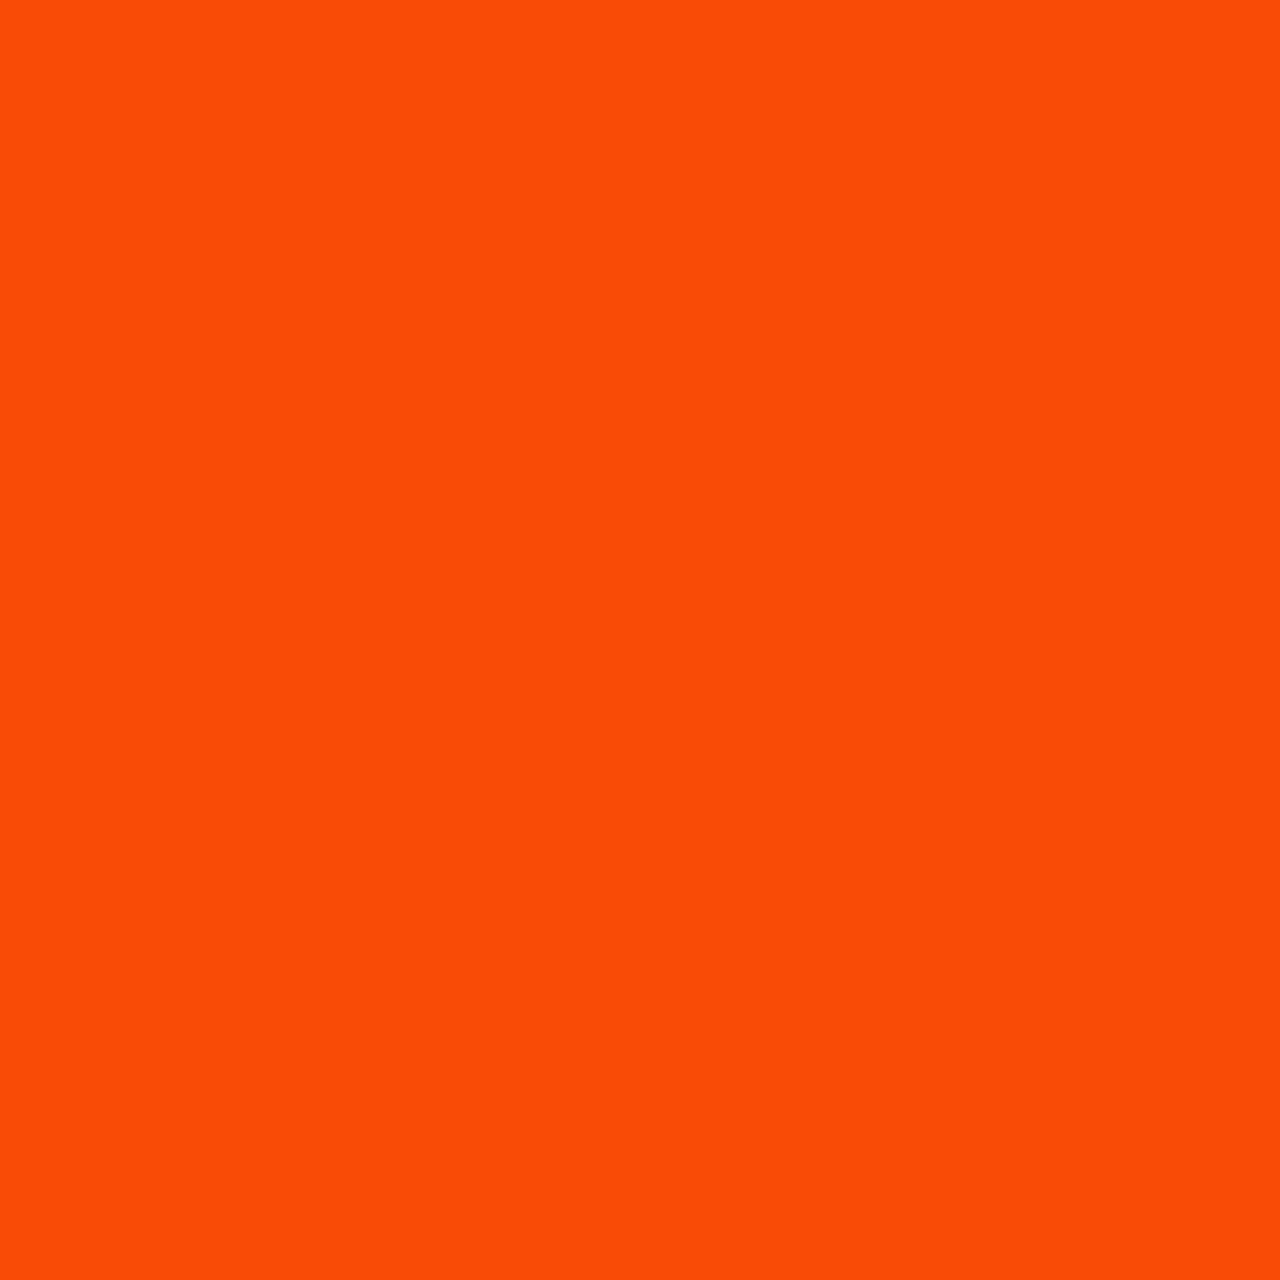 #0022 Rosco Gels Roscolux Deep Amber, 20x24